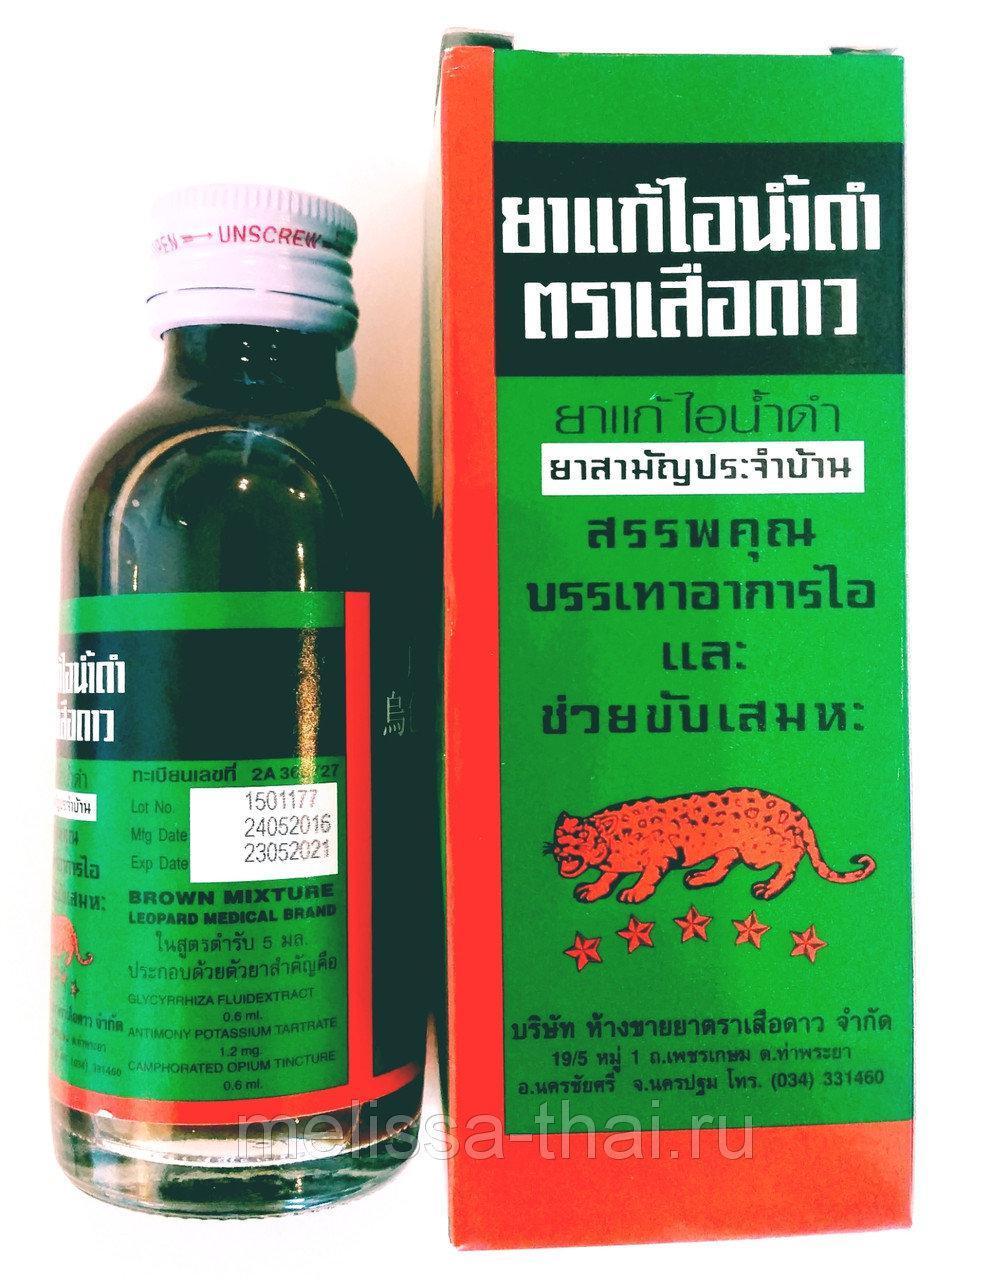 Тайская микстура от кашля Леопард (Leopard Brown Mixture), 60 мл